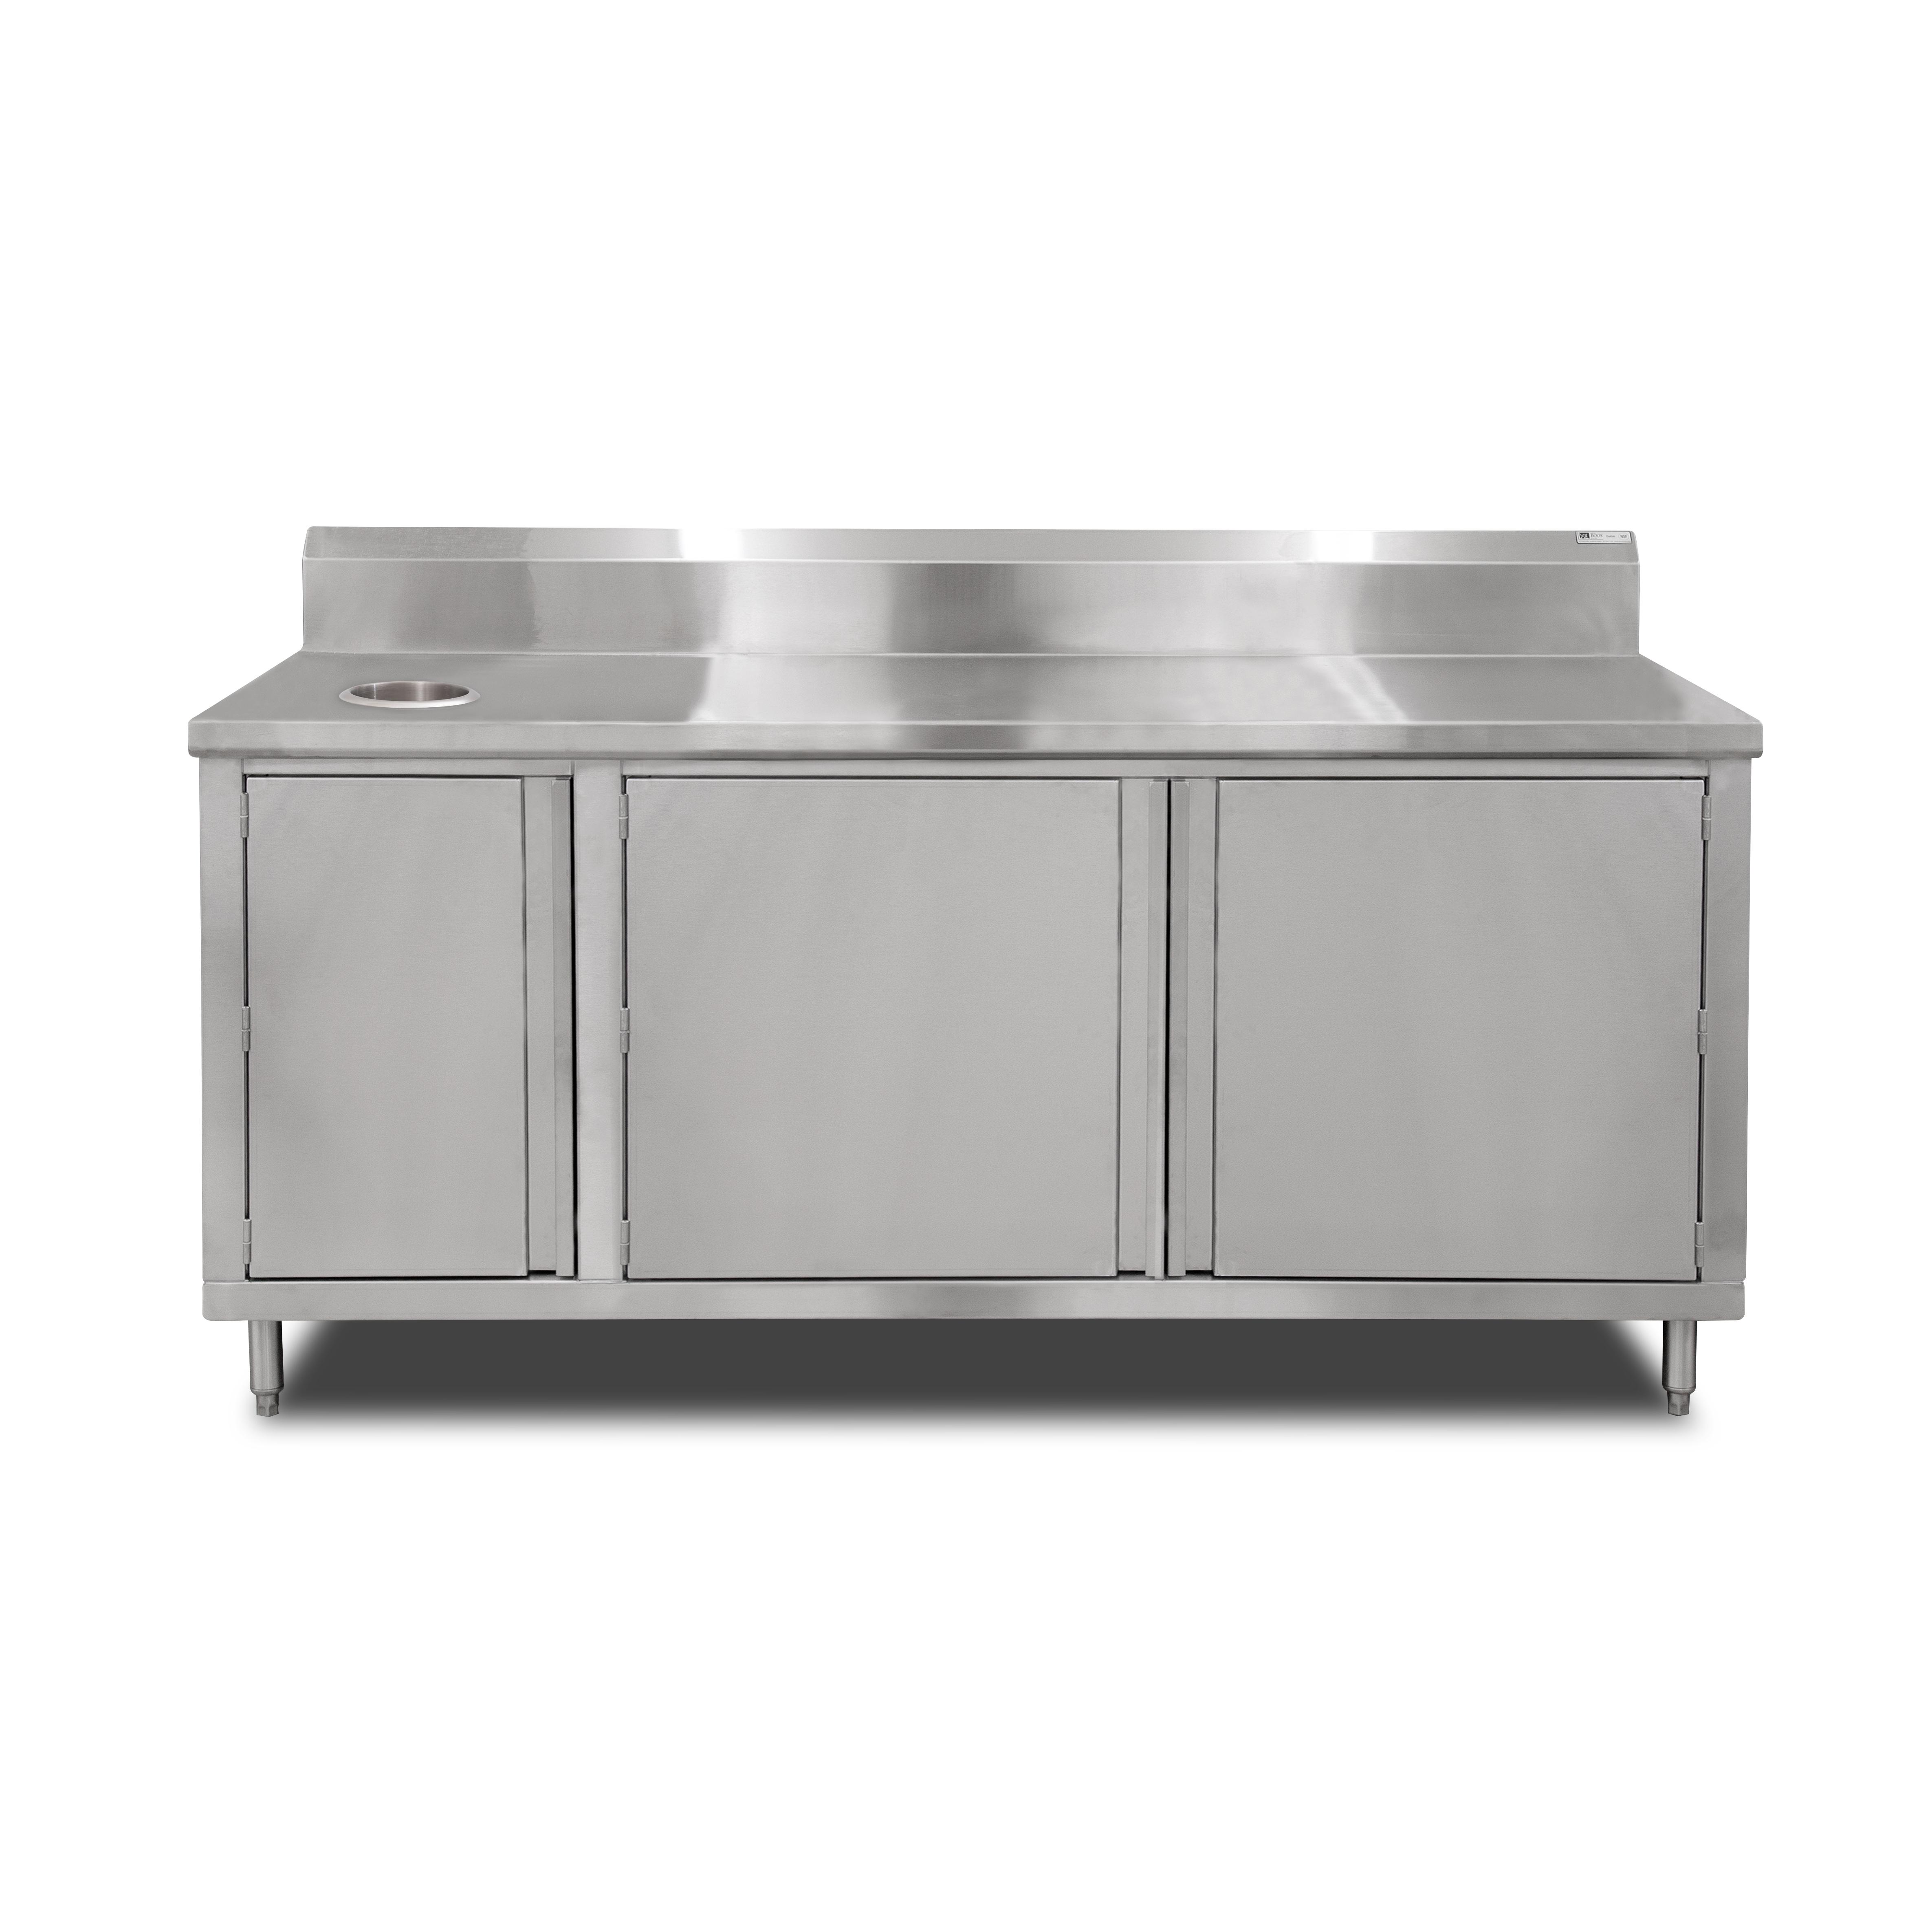 John Boos 4BU4R5-3660-L work table, cabinet base hinged doors